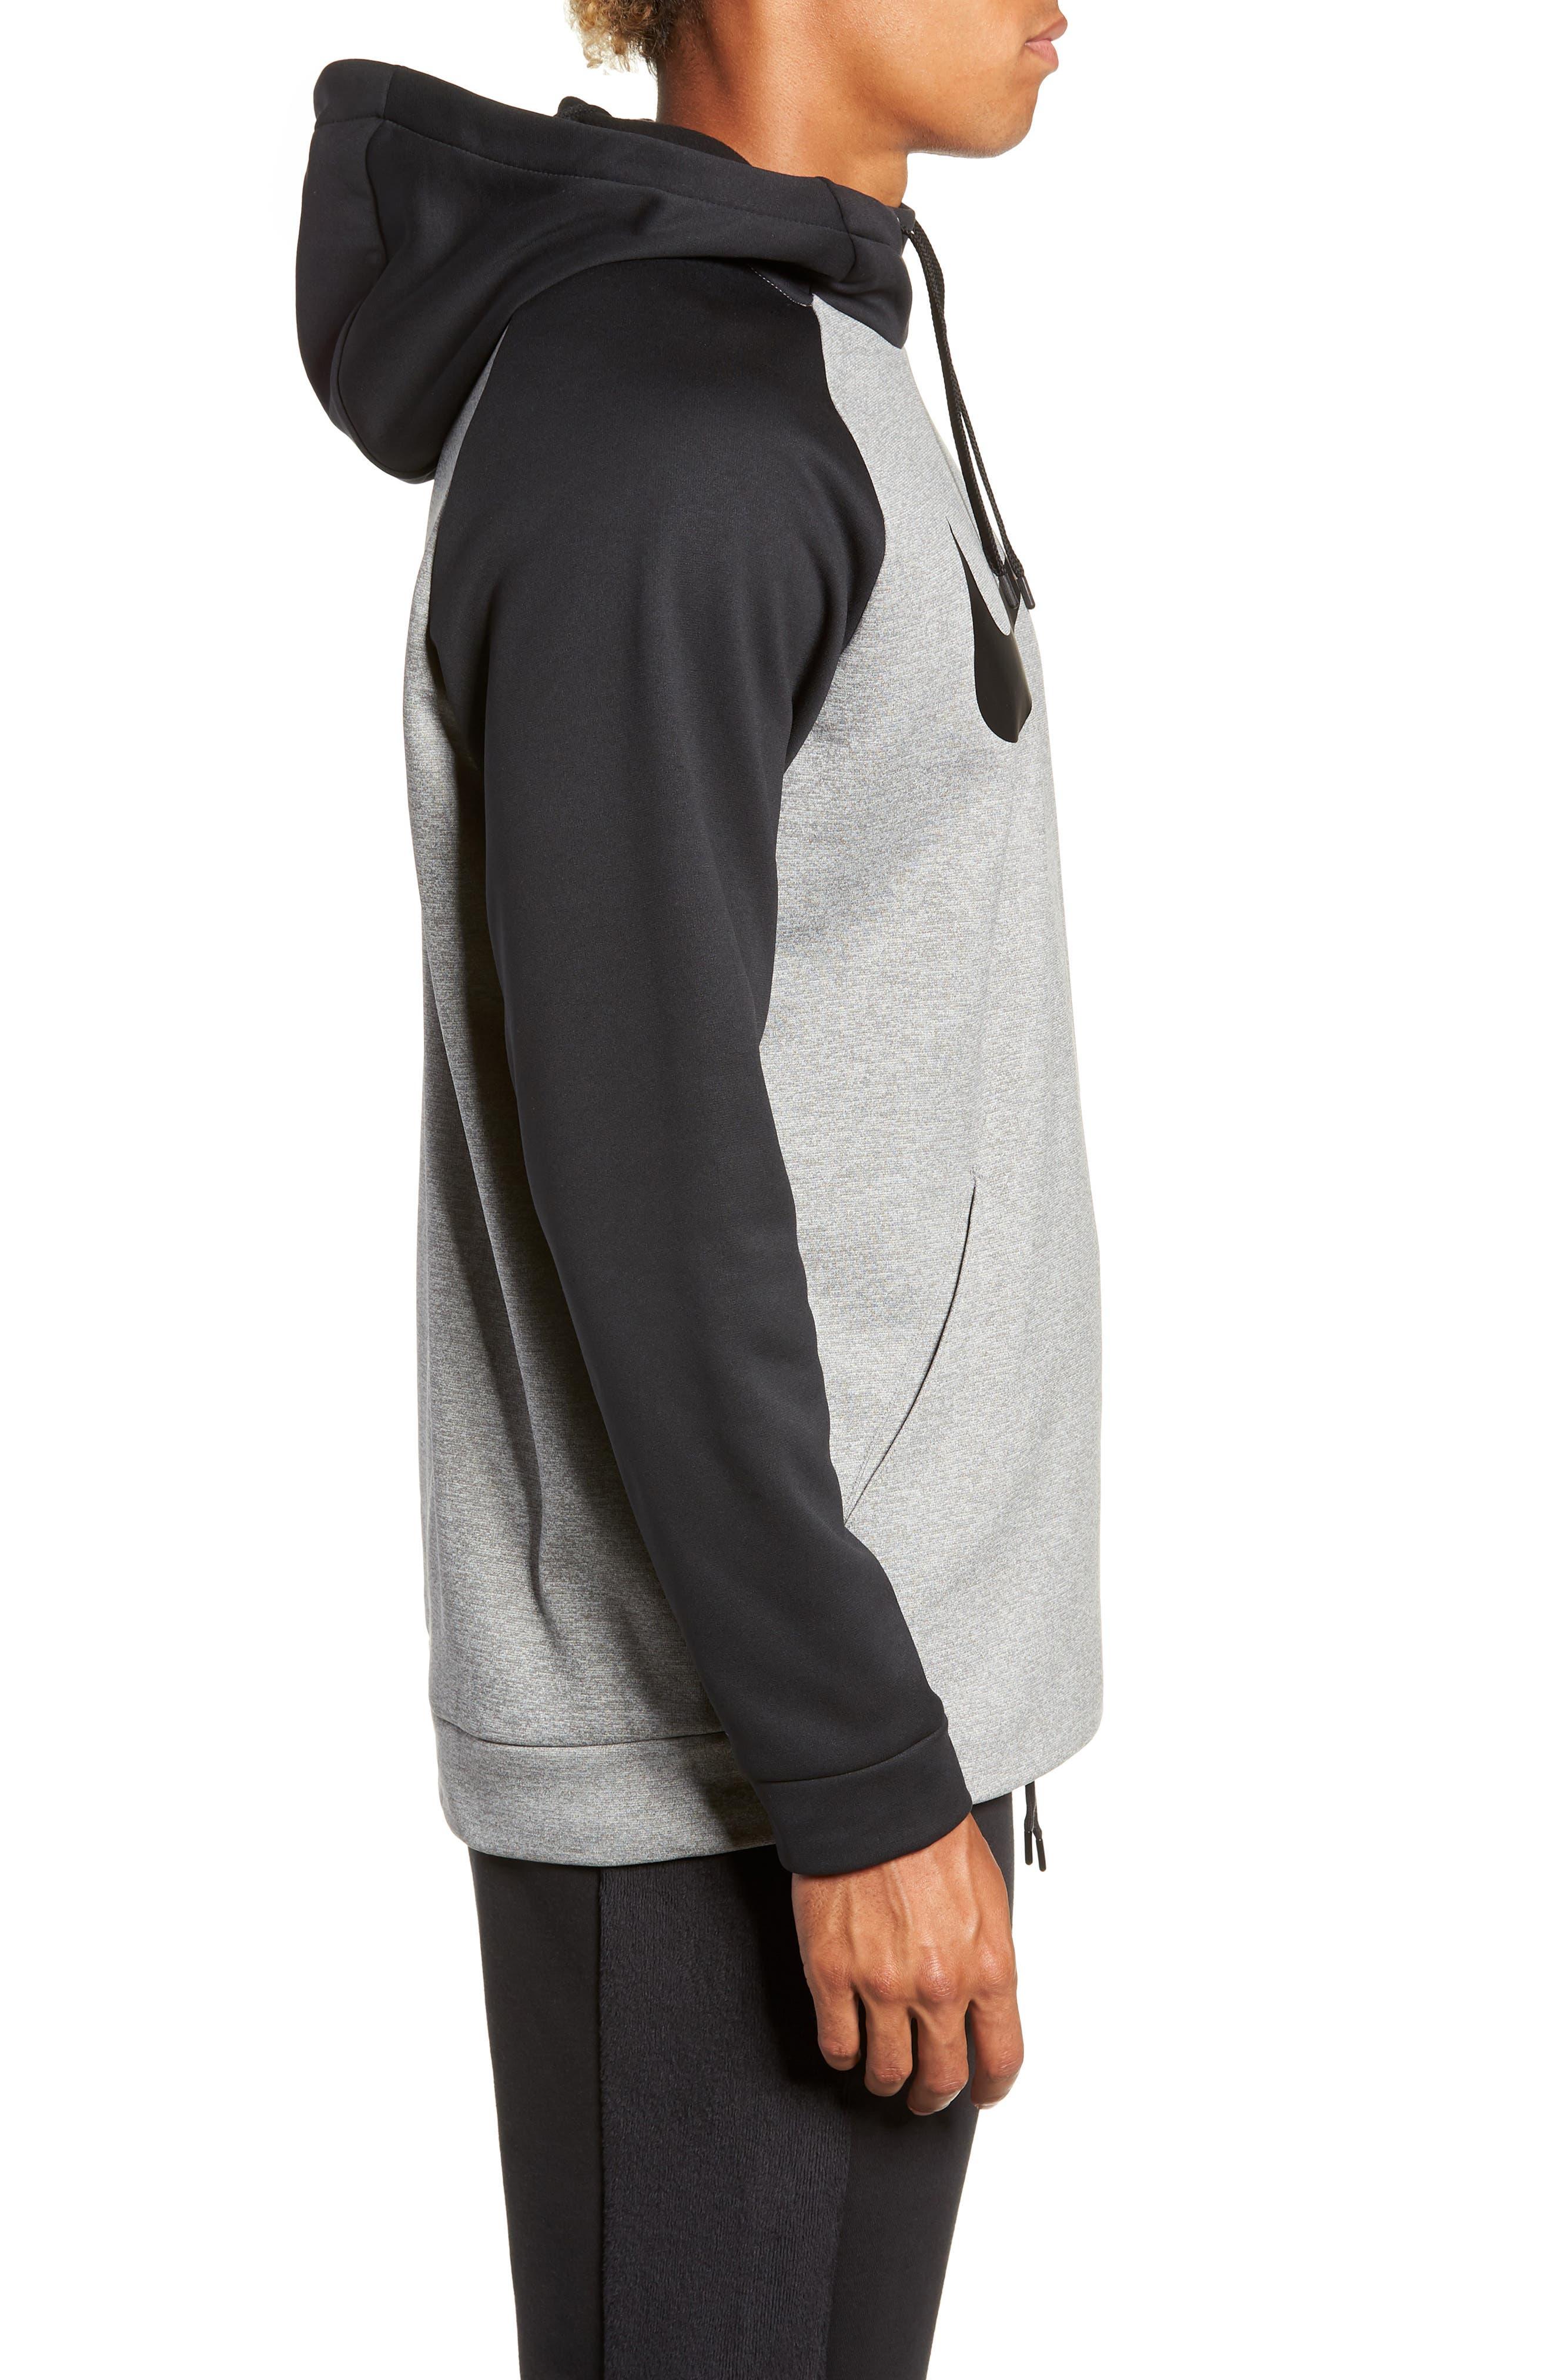 Therma Swoosh Dry Pullover Hoodie,                             Alternate thumbnail 3, color,                             DK GREY HEATHER/ BLACK/ BLACK